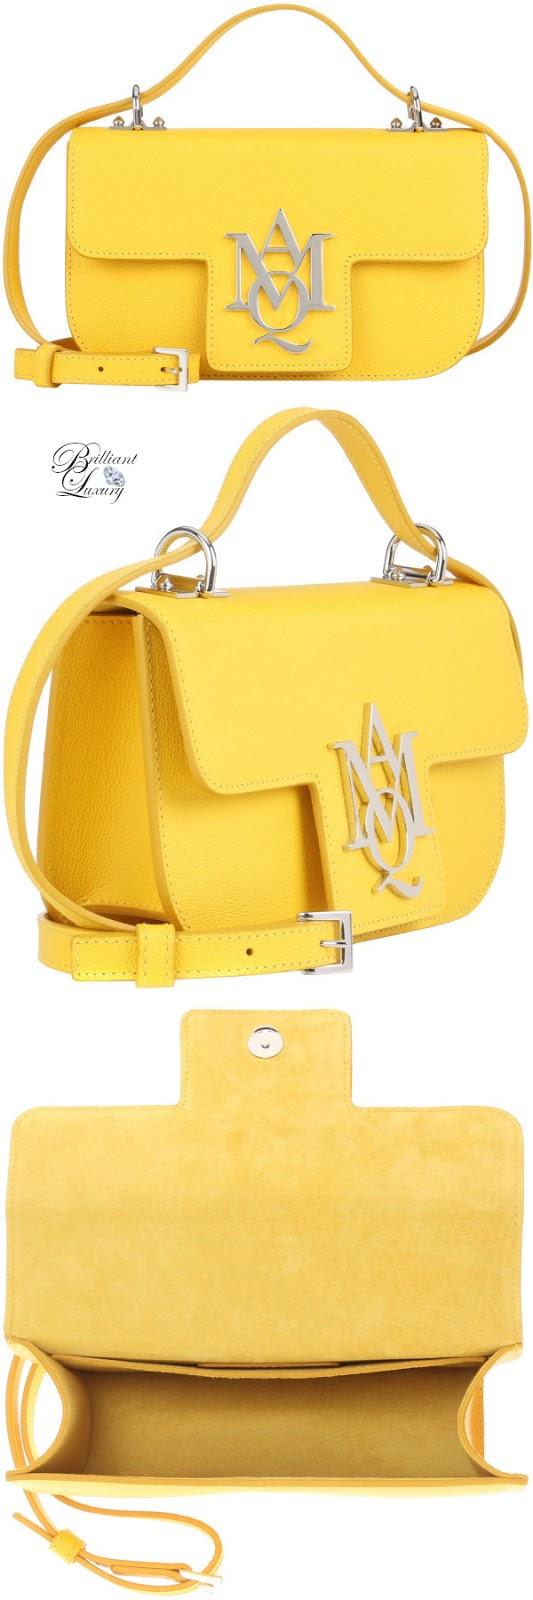 Brilliant Luxury♦Alexander McQueen Insignia crossbody leather satchel in yellow